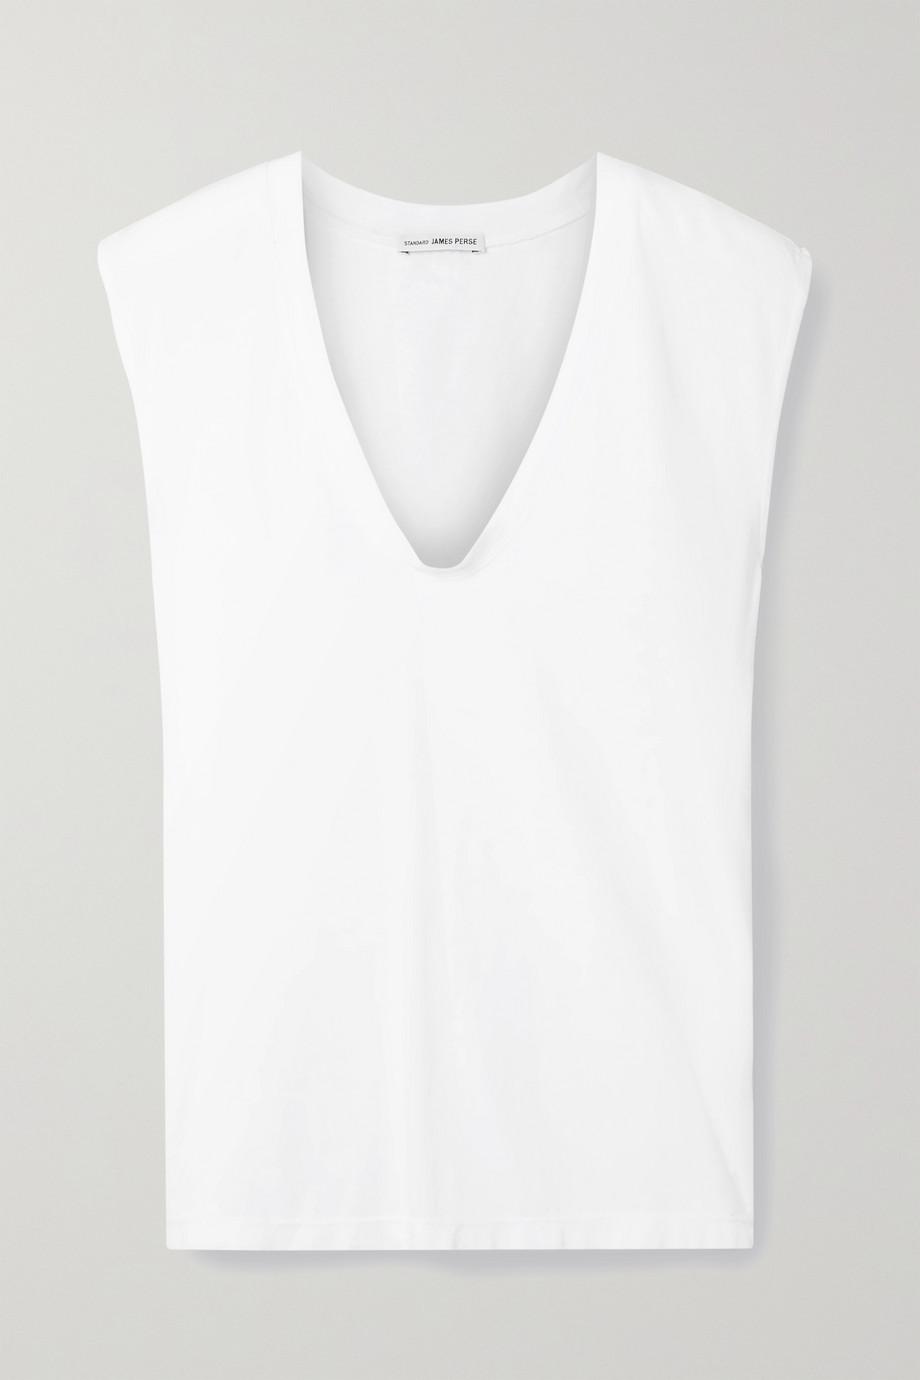 James Perse Slub cotton-jersey tank